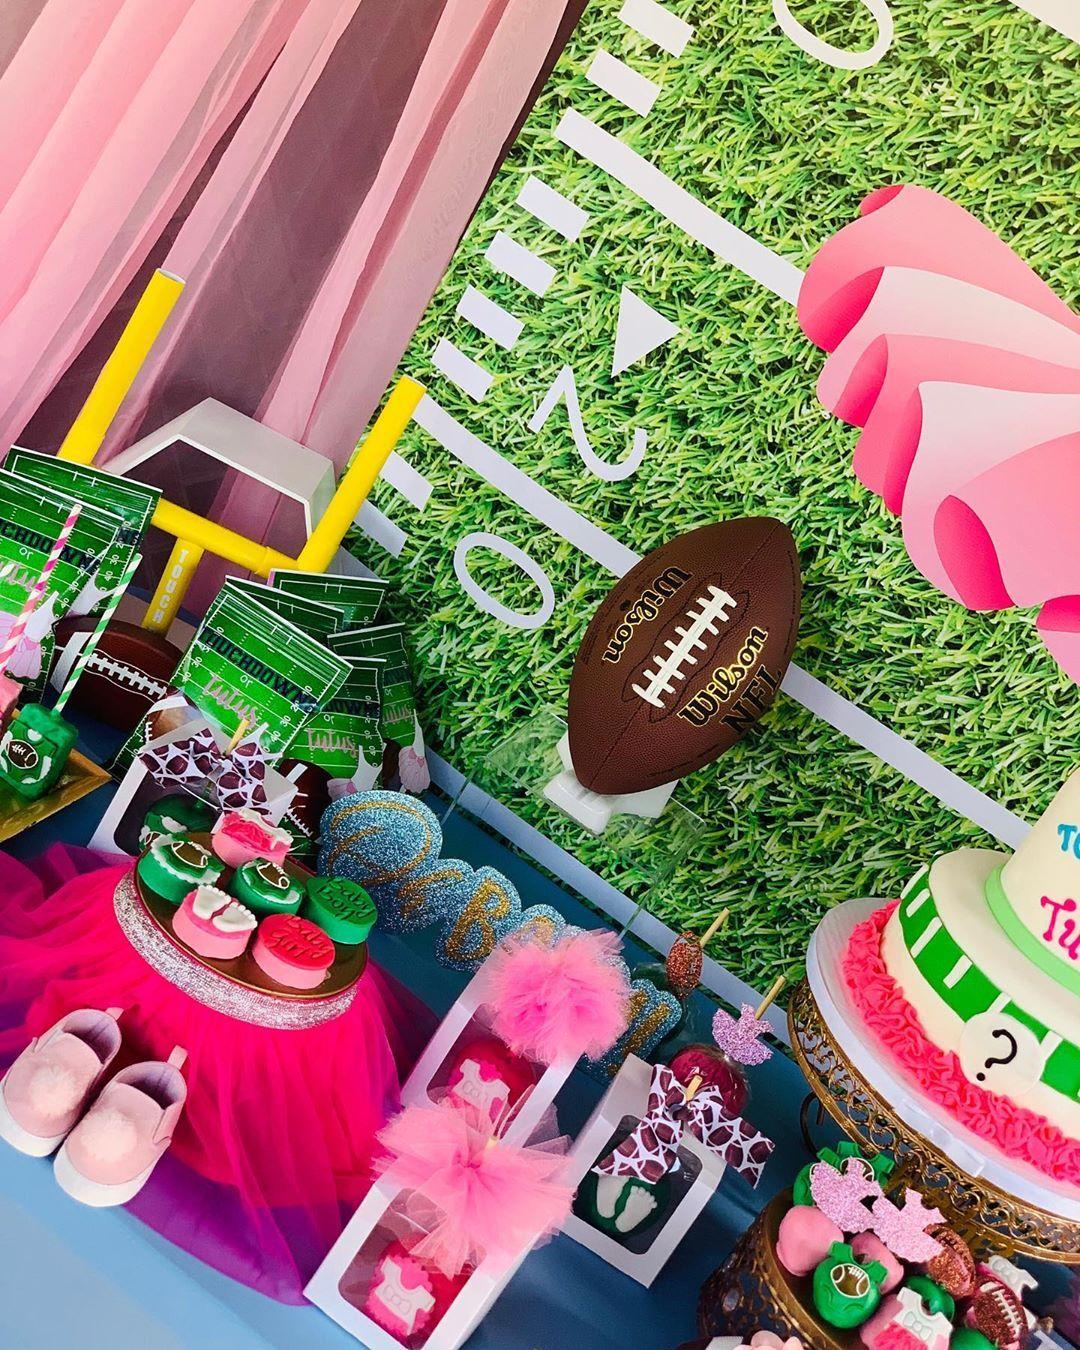 K K Sweetevents On Instagram Touchdowns Or Tutus Gender Reveal Treat Table Tutus Gender Reveal Gender Reveal Decorations Gender Reveal Invitations